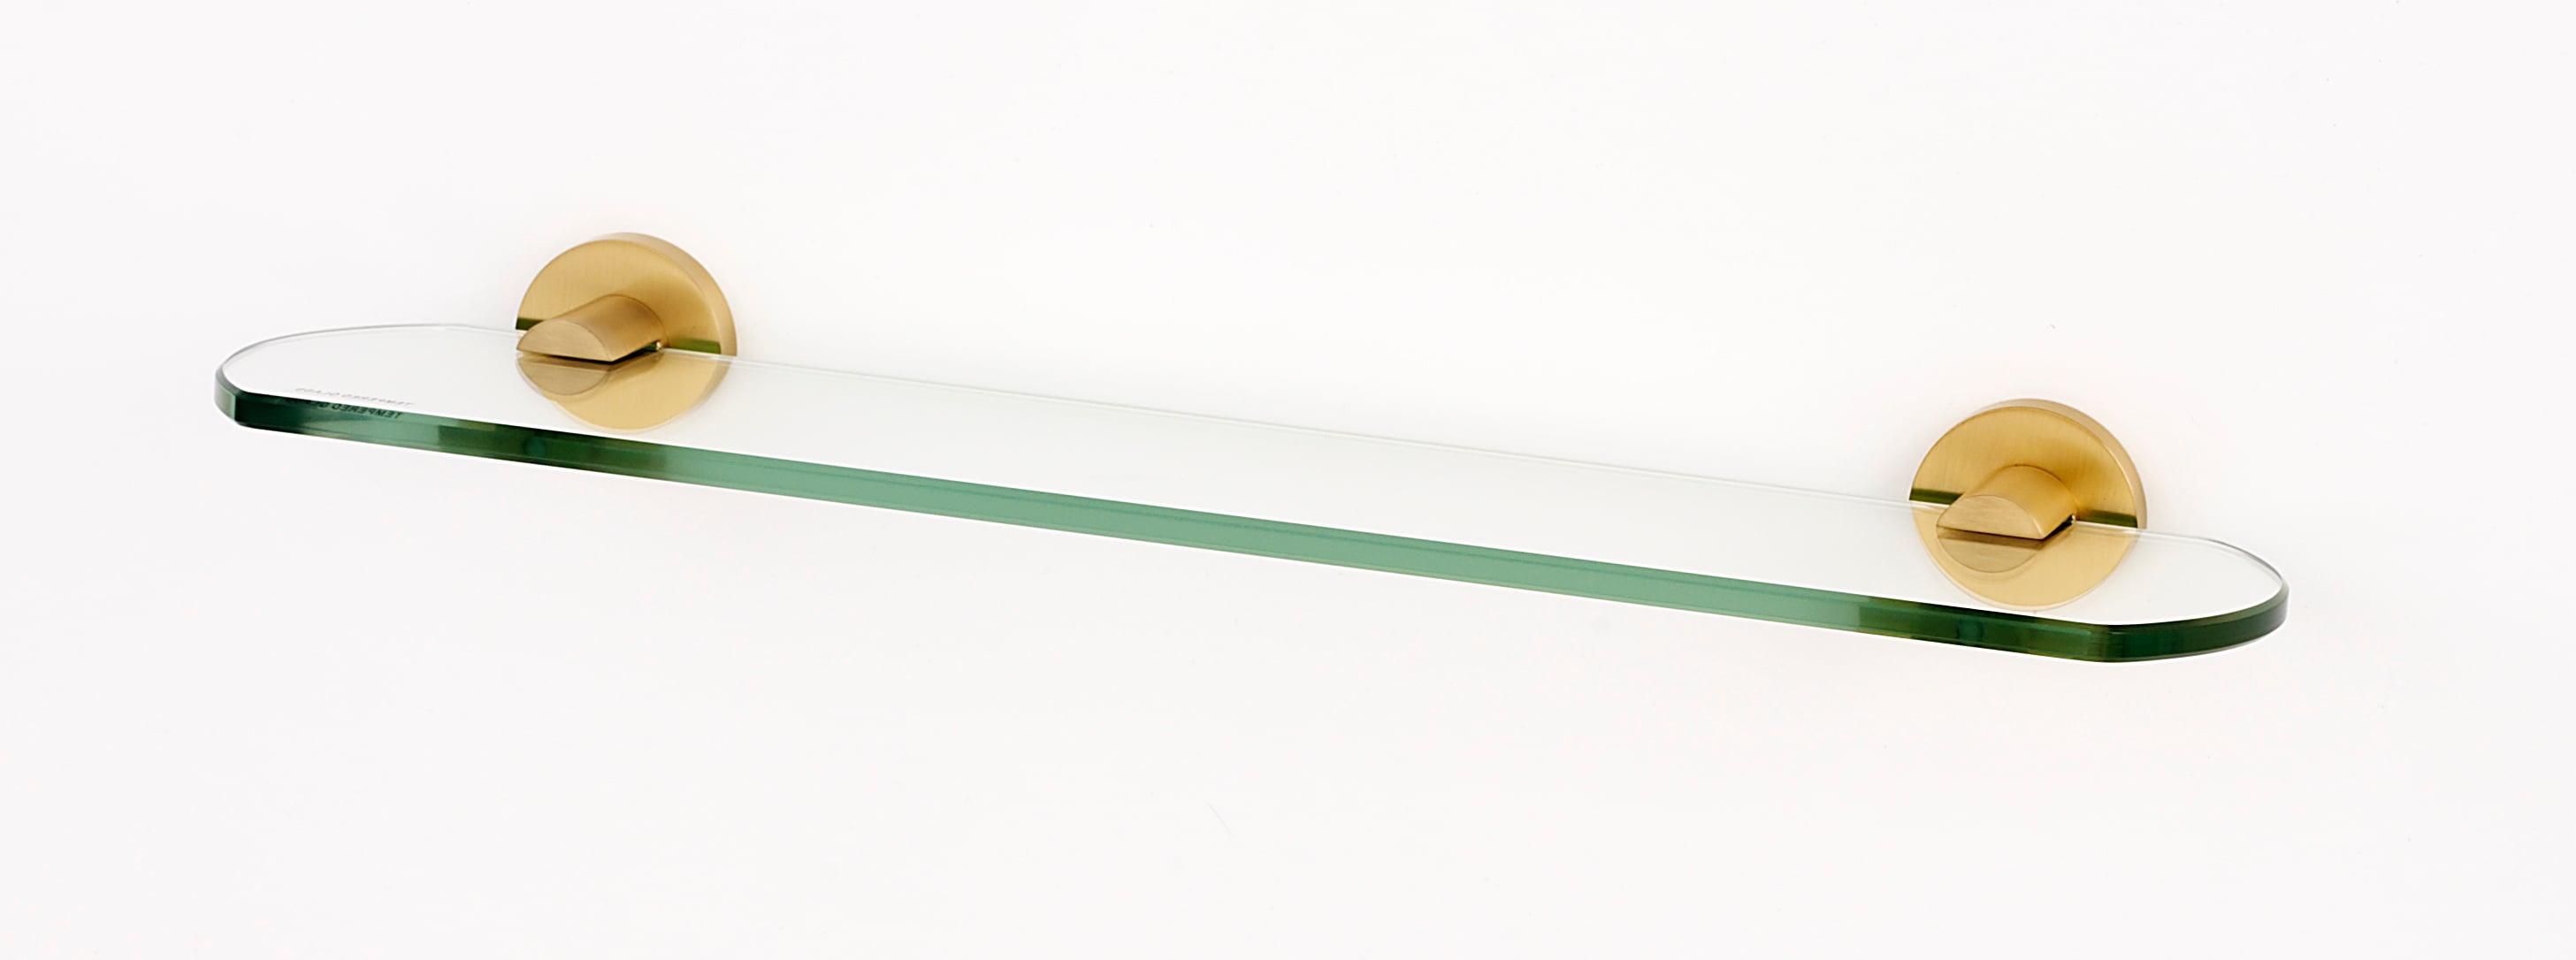 Alno A8350 24 Sb Satin Brass Contemporary I 24 Inch Glass